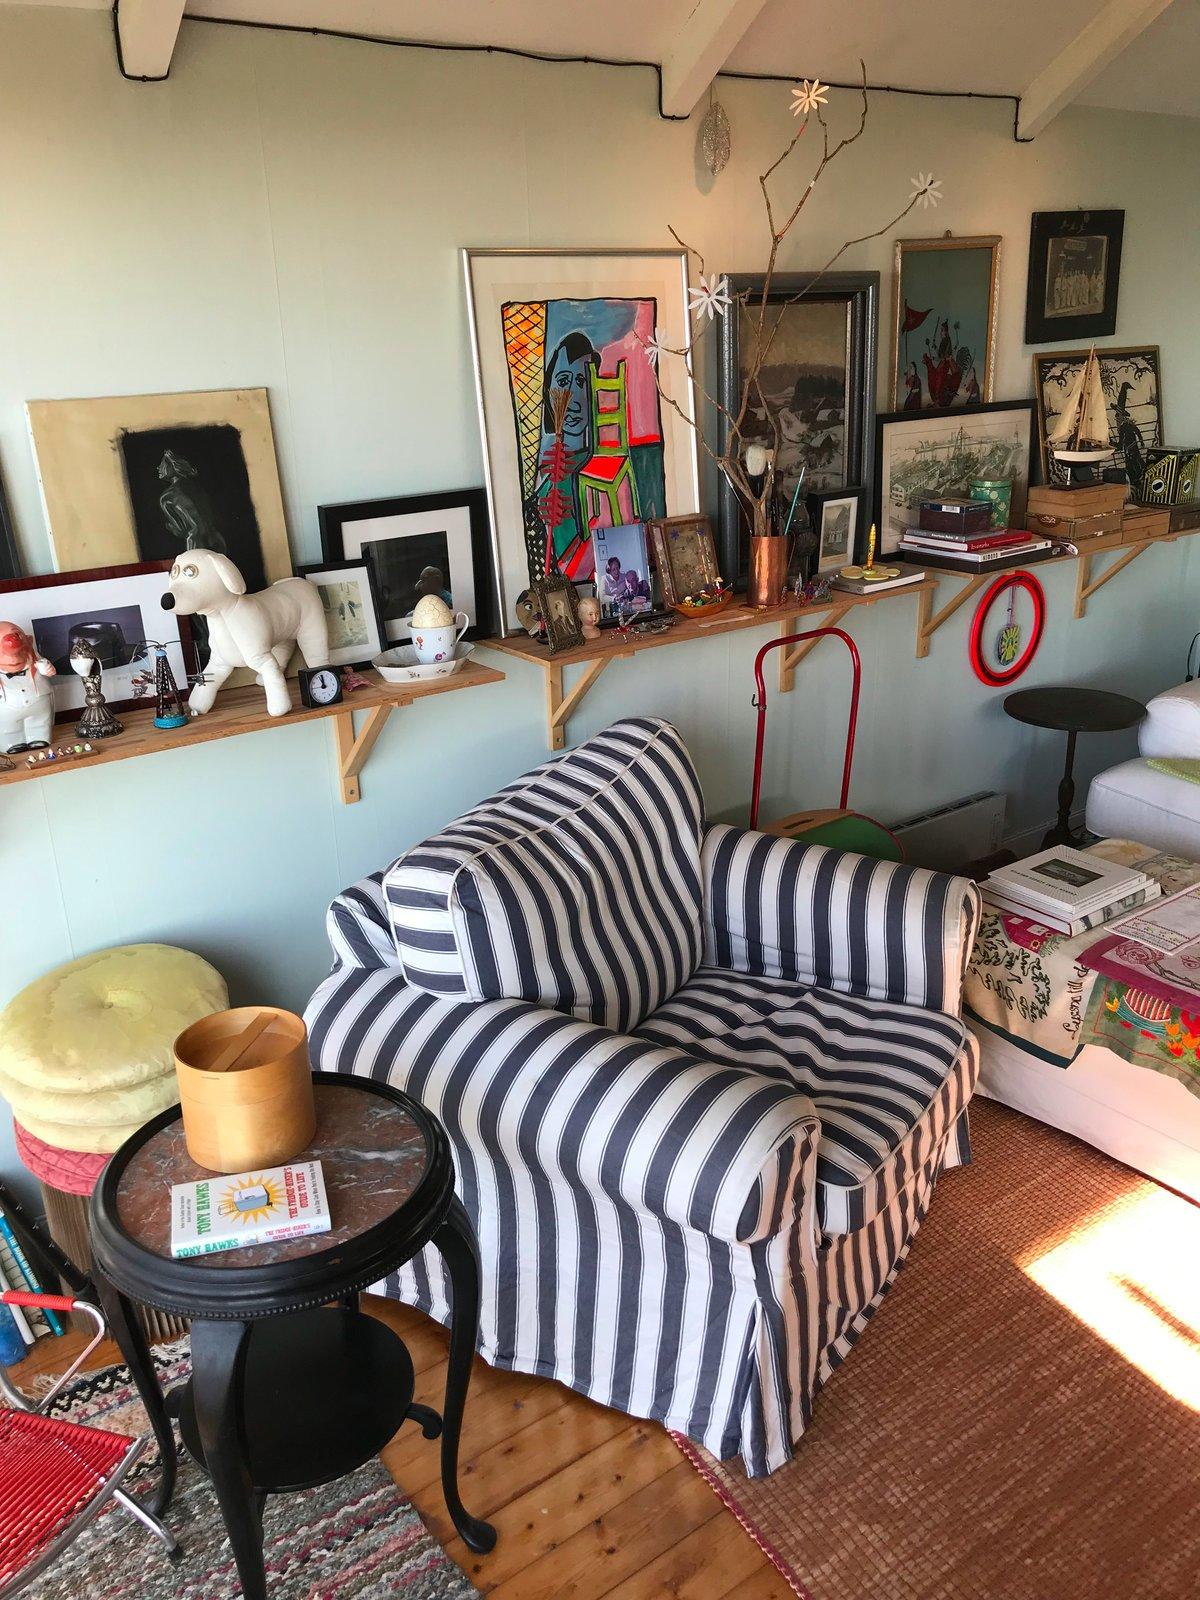 Living Room, Wall Lighting, Sofa, Chair, Ceiling Lighting, Coffee Tables, Floor Lighting, Light Hardwood Floor, Bookcase, Hanging Fireplace, and Wood Burning Fireplace  Paradiso